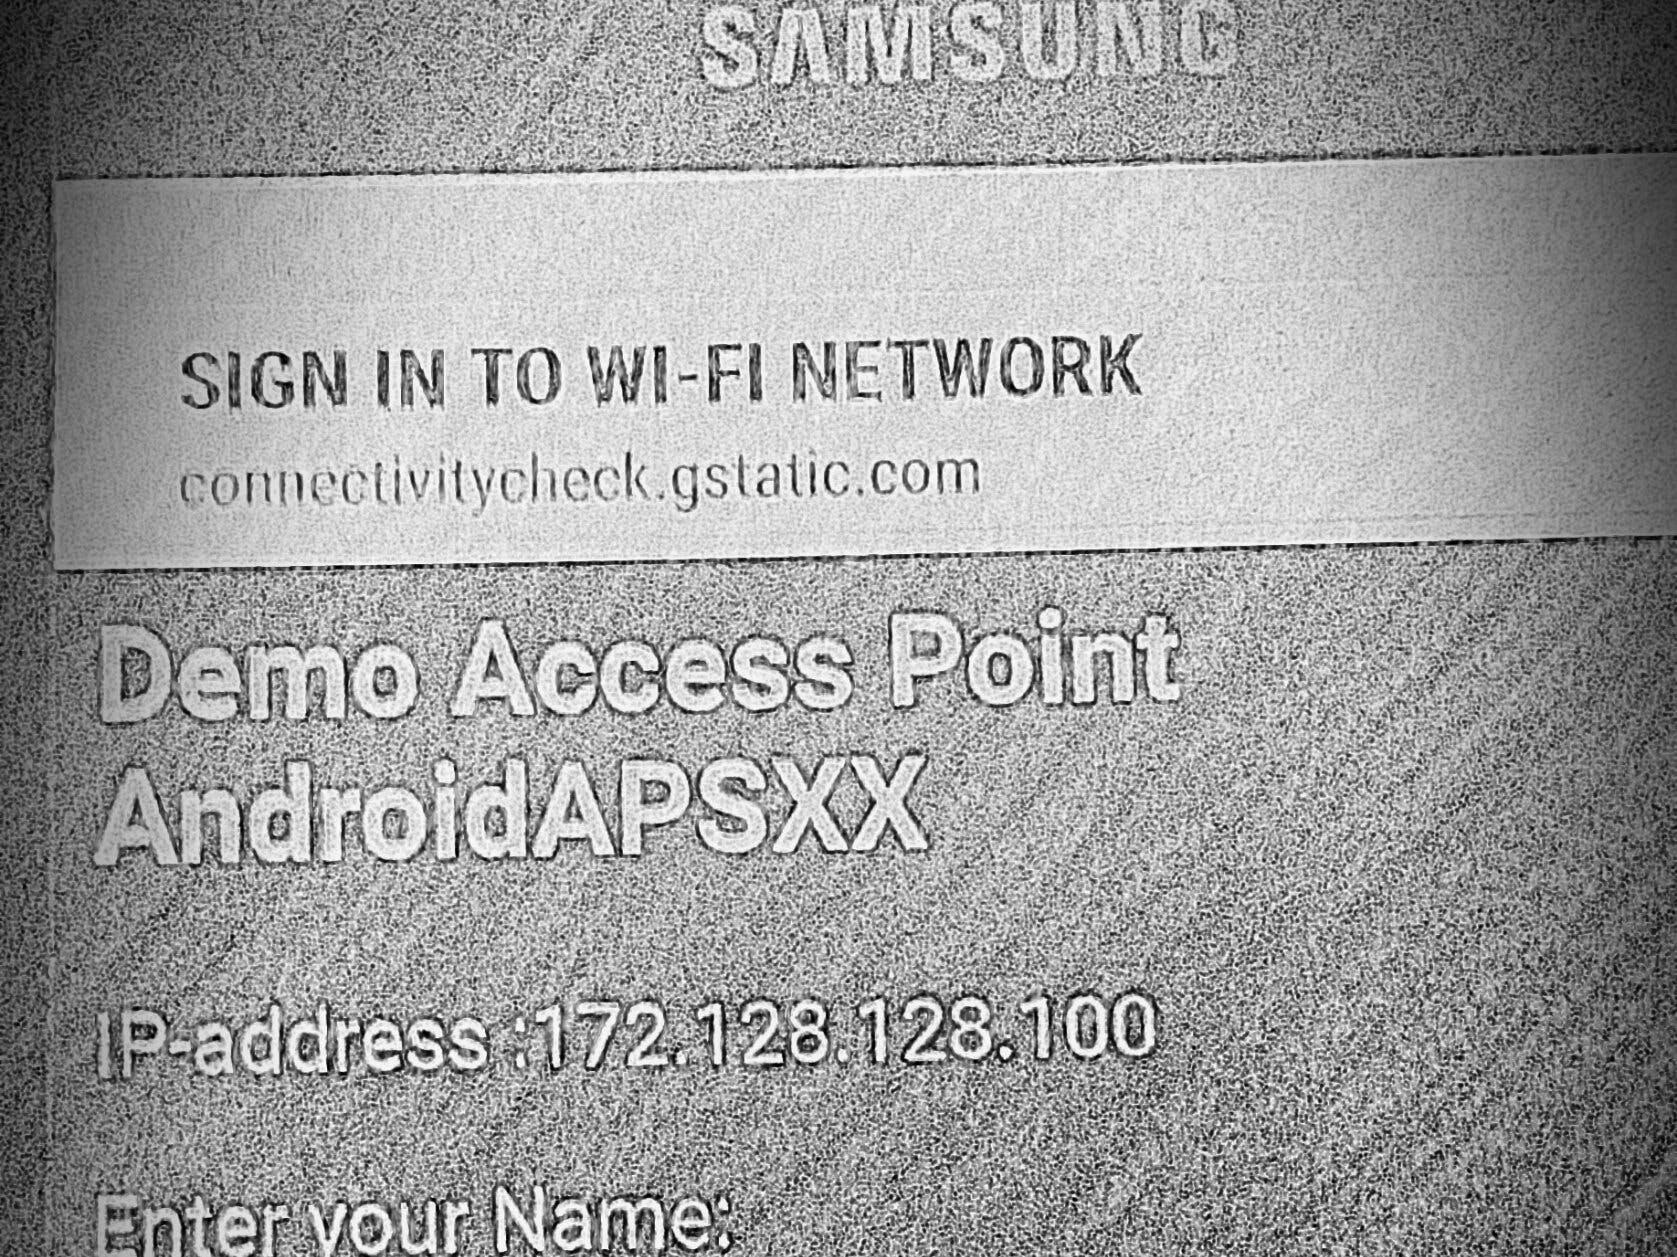 Captive Portal for WiFi AP